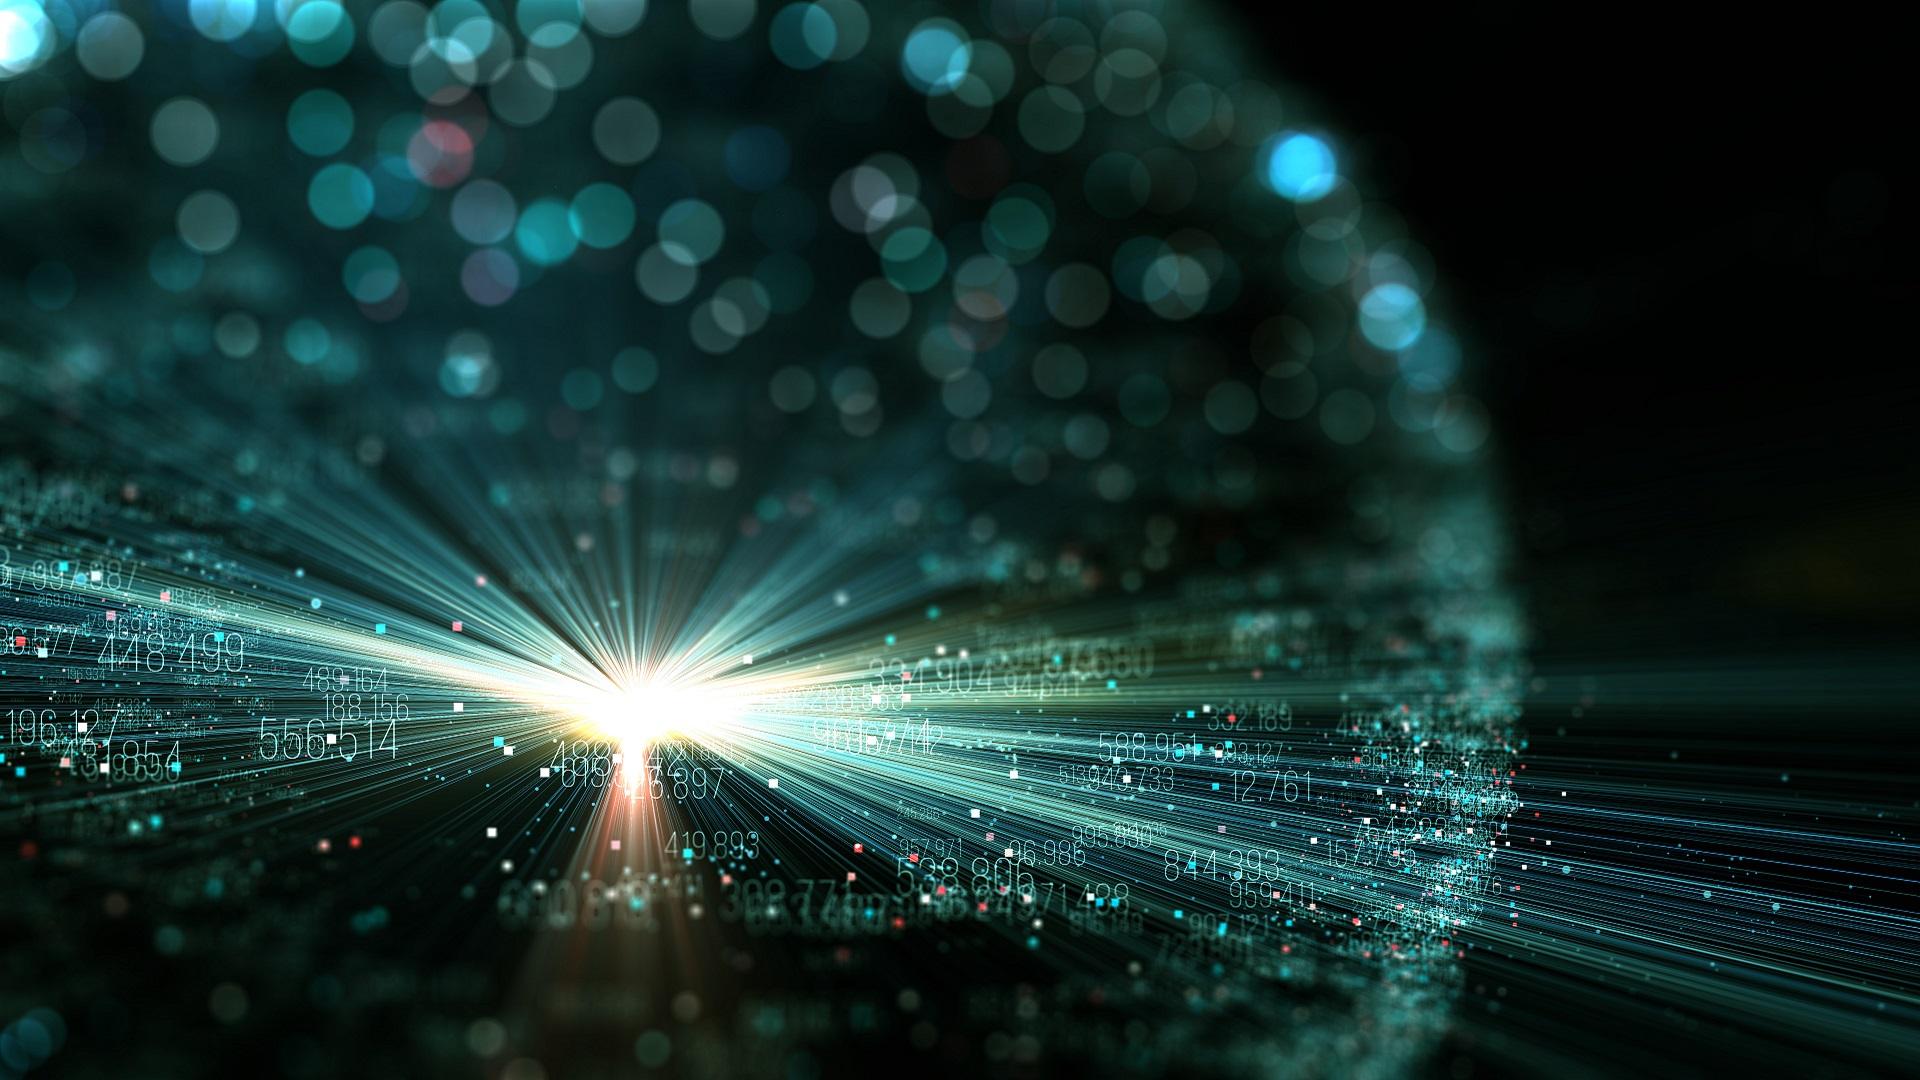 fibre optics and numbers